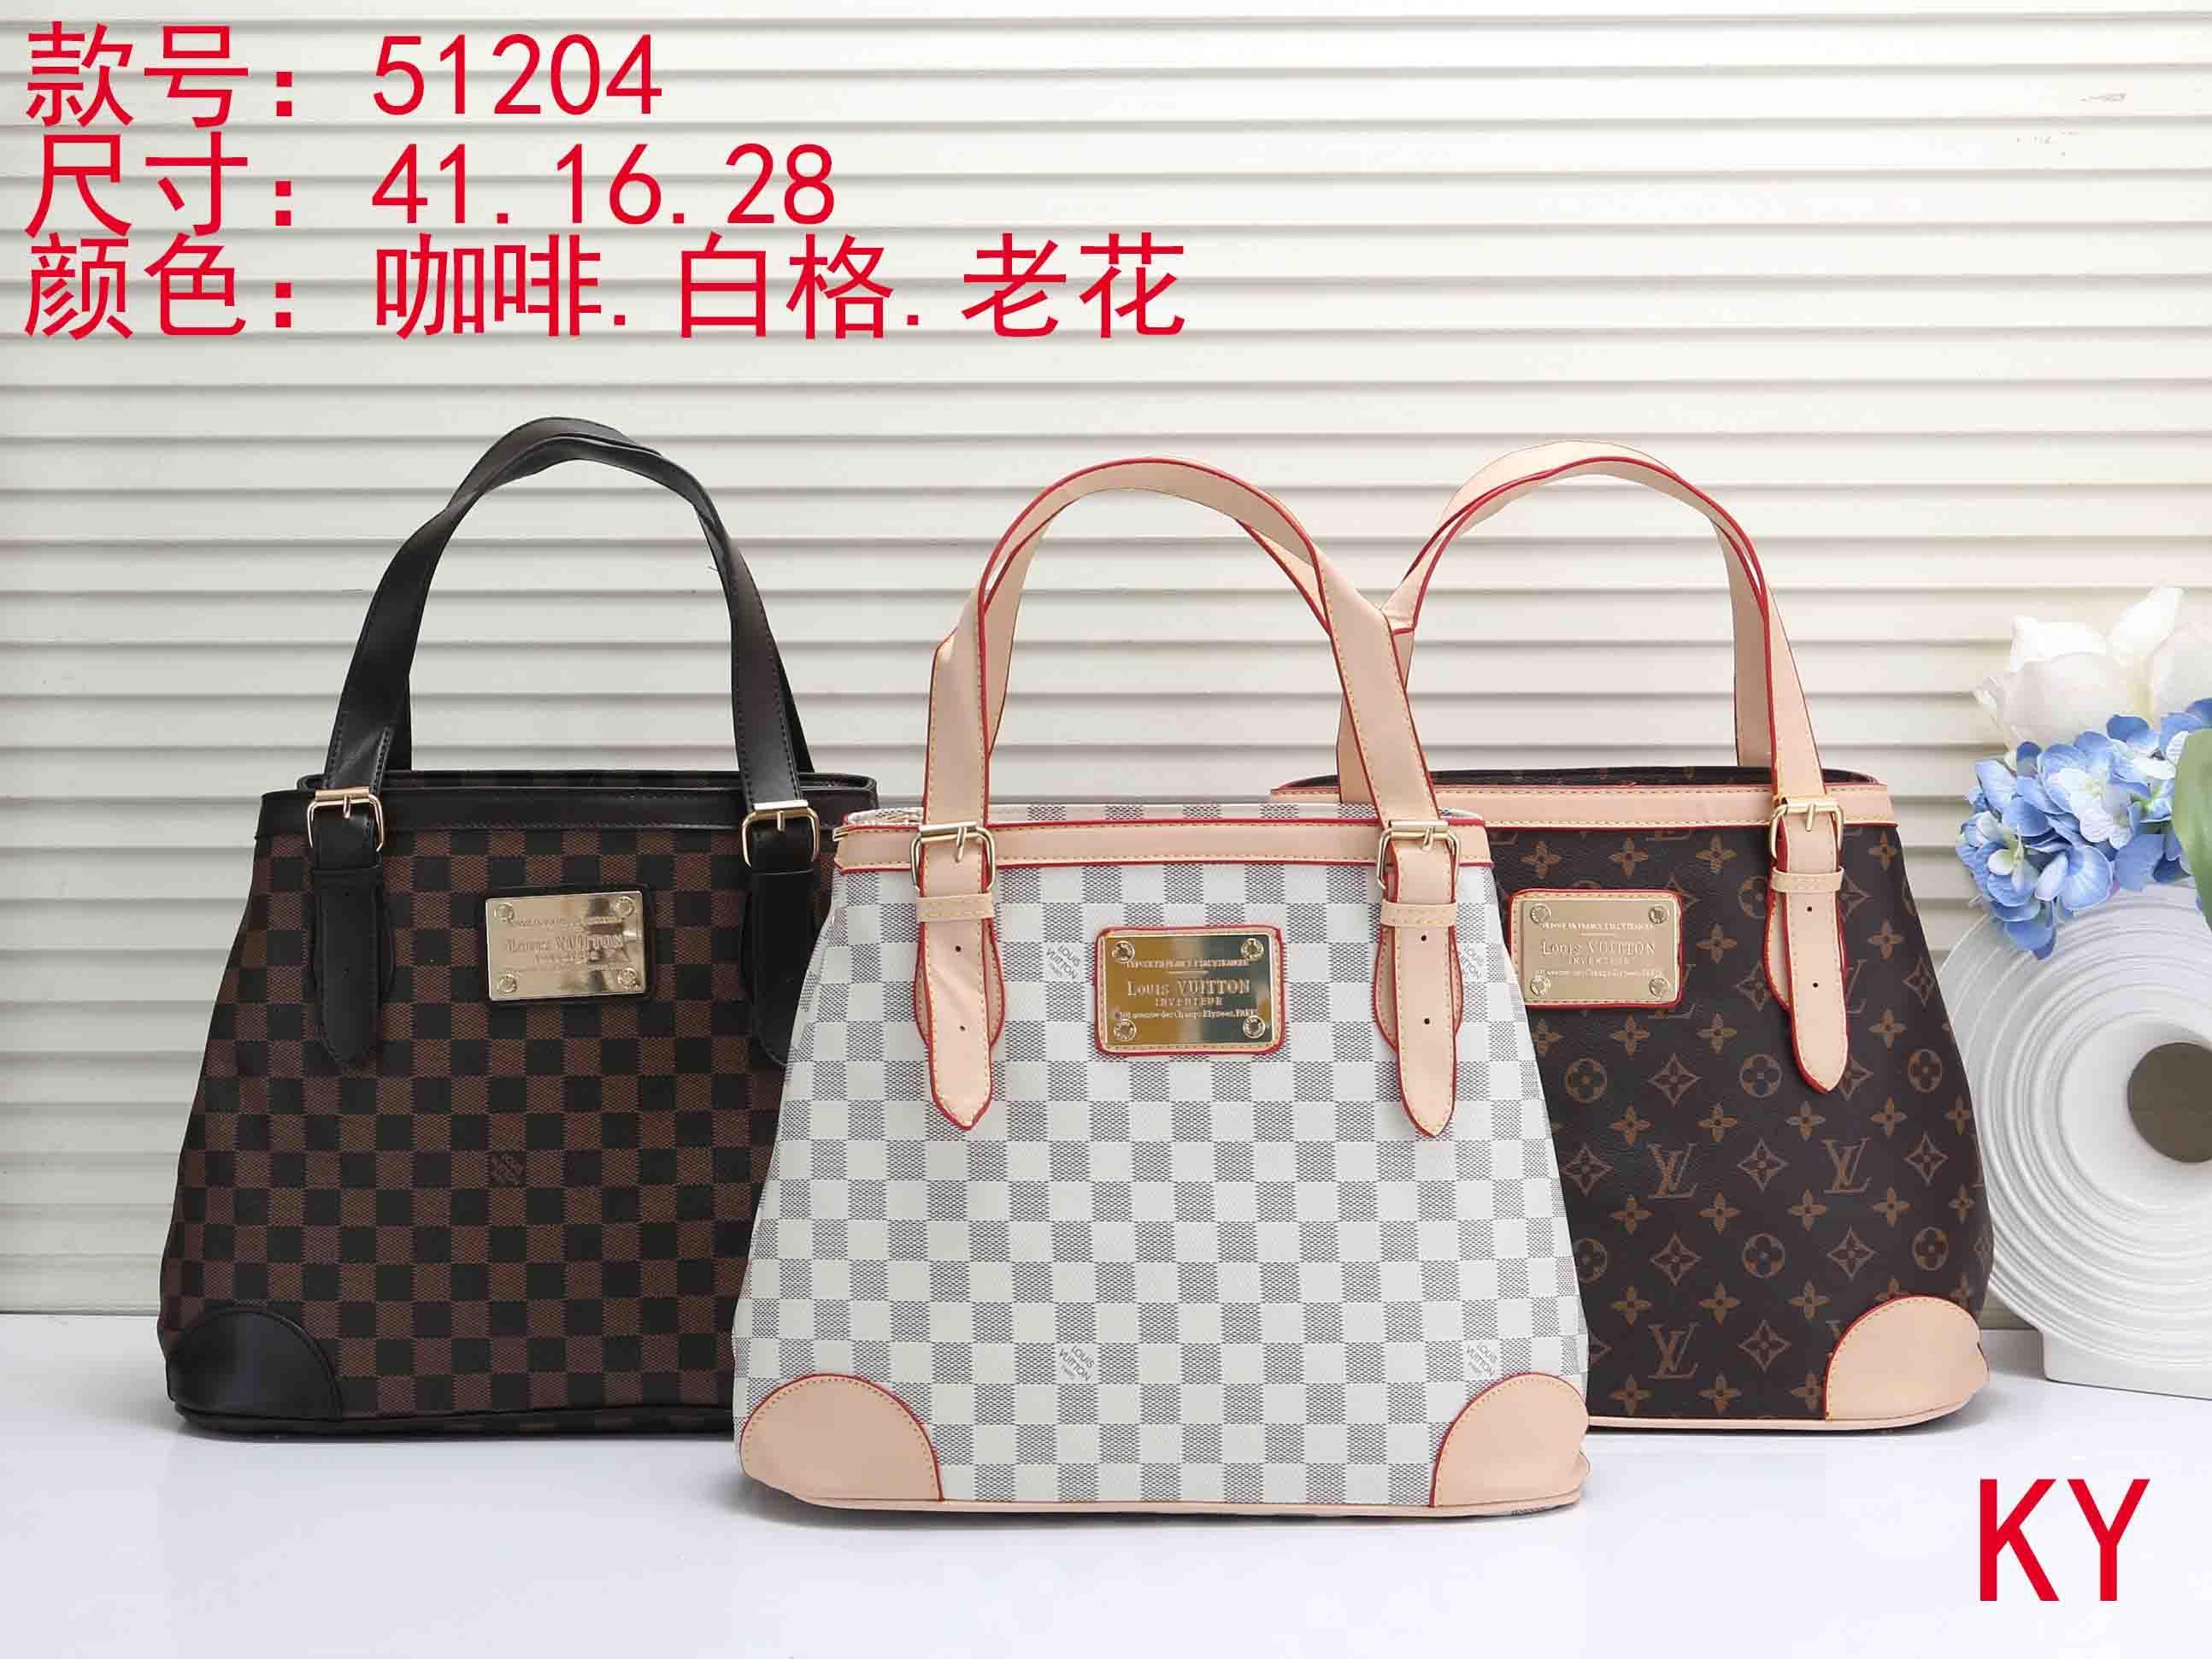 Brand New 2019 Women Handbags Pu Leather High Quality Letter Female Bag  Designer Bolsos Mujer Sac A Main Totes L51204 Mens Work Bags Briefcases For  Women ... 4e4f3cbf0f370